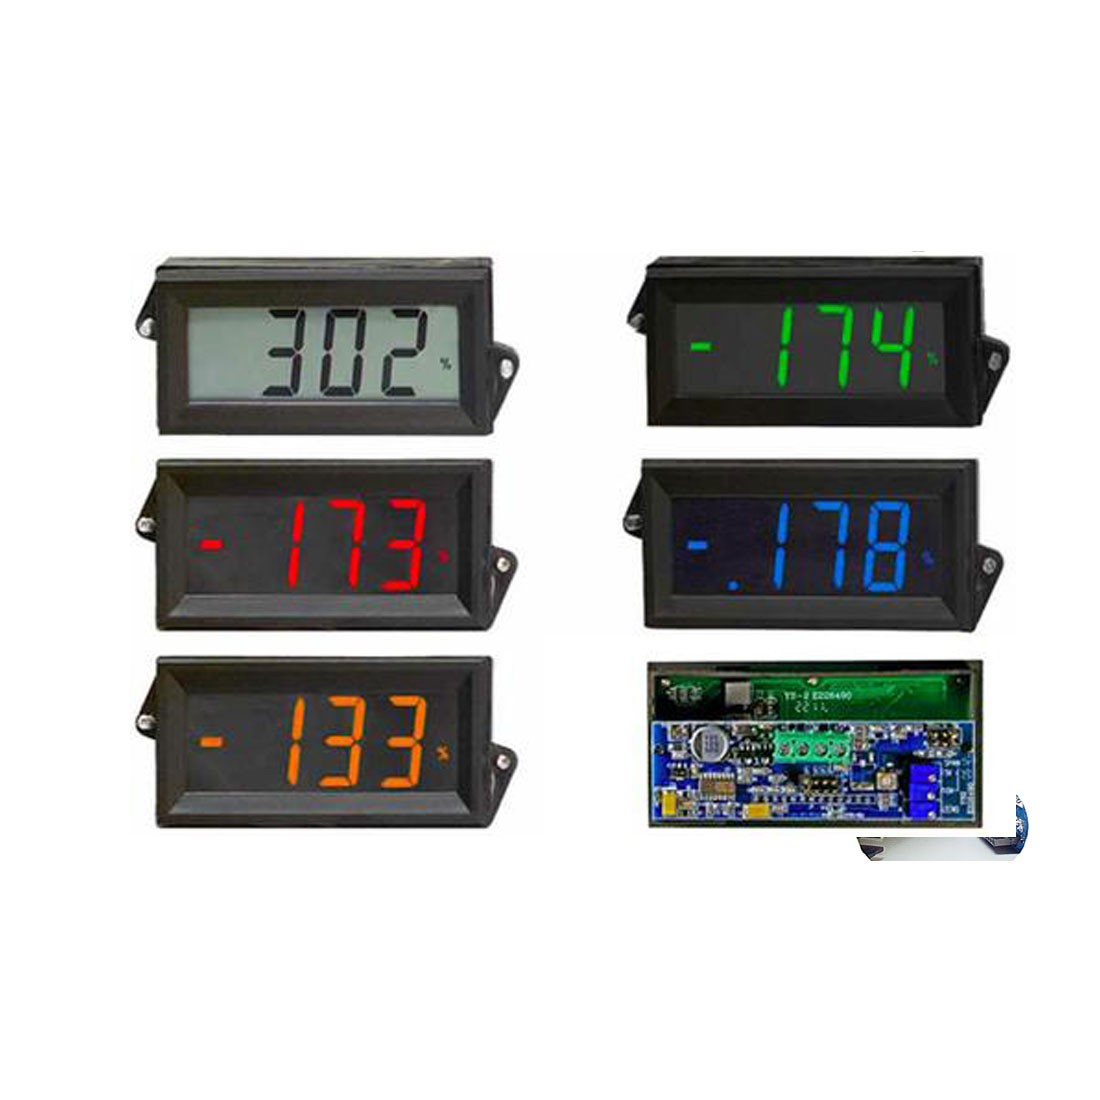 HVPI-24 Series Voltage Powered LCD Digital Panel Meter